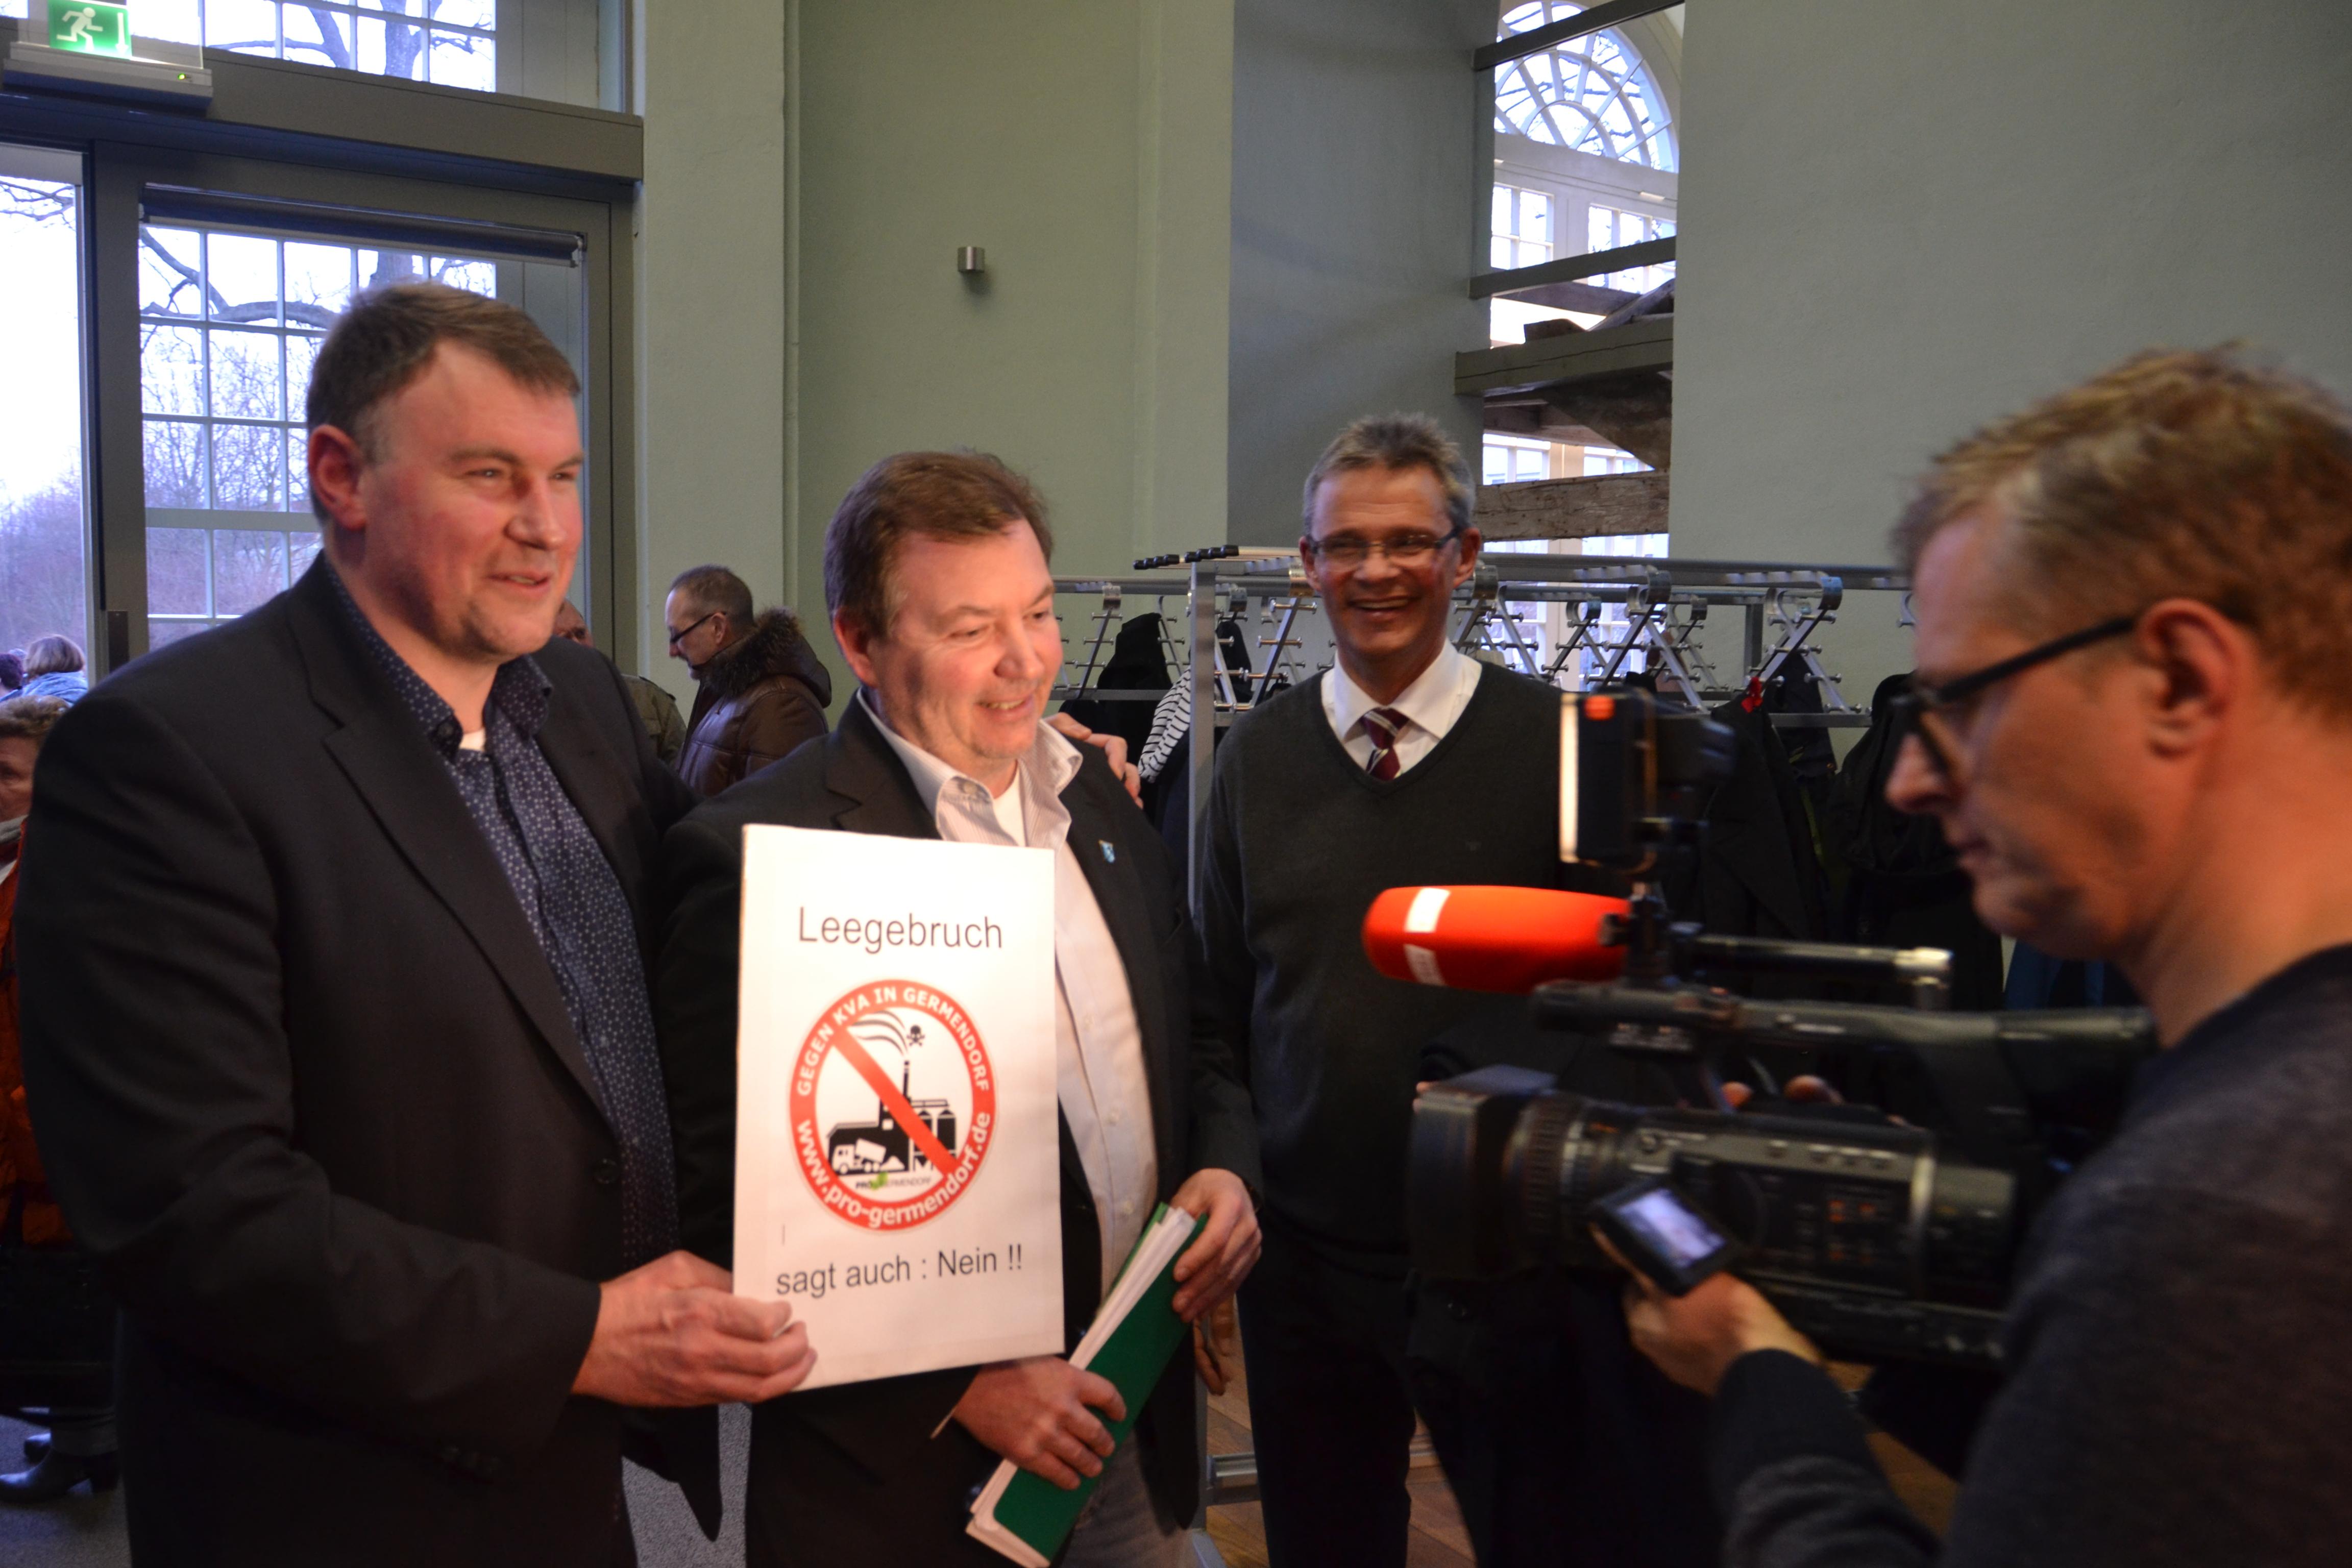 RBB Fernsehen berichtet über Aktionsbündnis Contra KVA